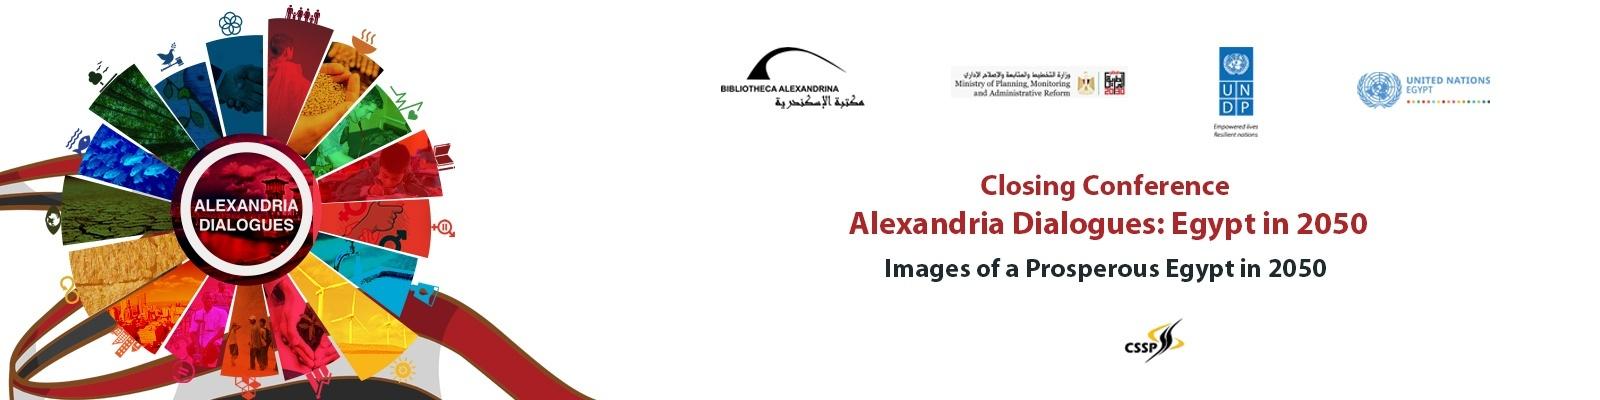 "مؤتمر ""مصر 2050: رؤى لمستقبل مزدهر"""